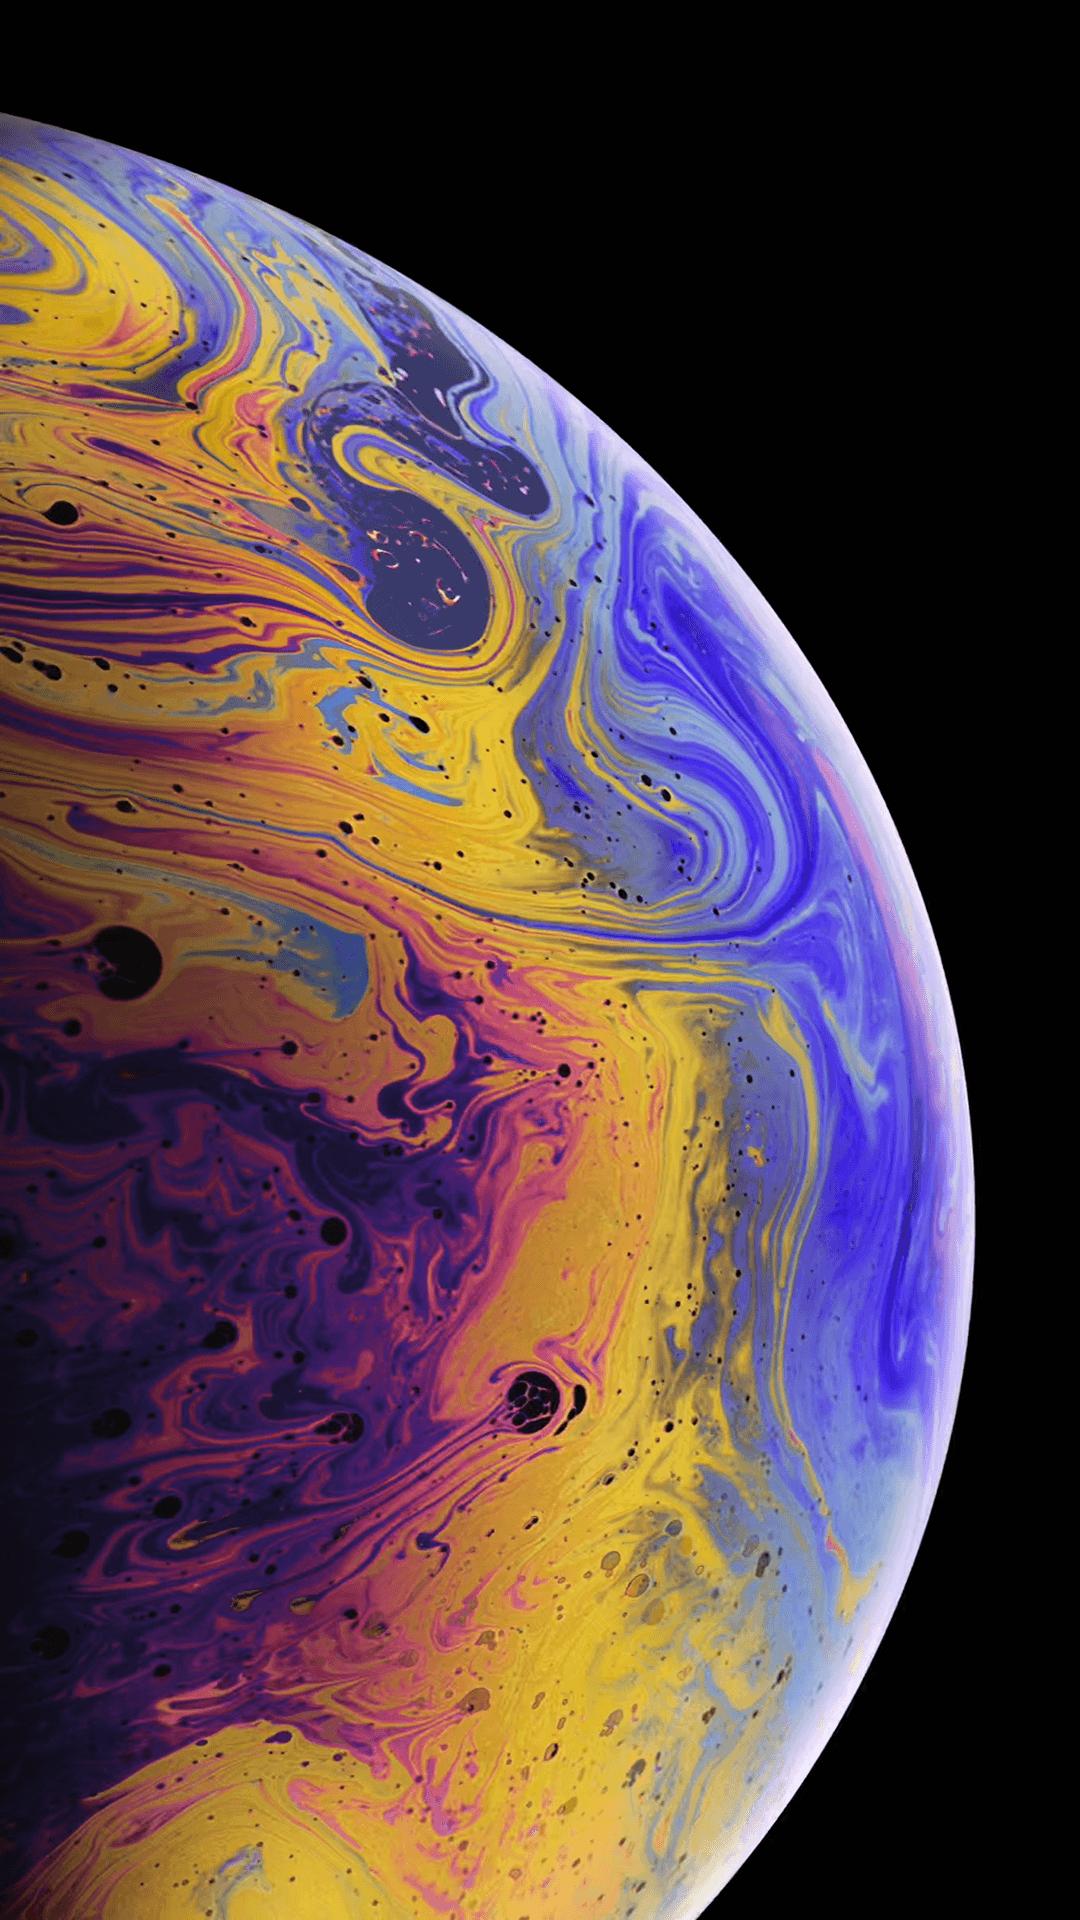 Apple Iphone Wallpaper Earth Billy S Ideas In 2020 Apple Wallpaper Iphone 4k Wallpaper Iphone Apple Wallpaper